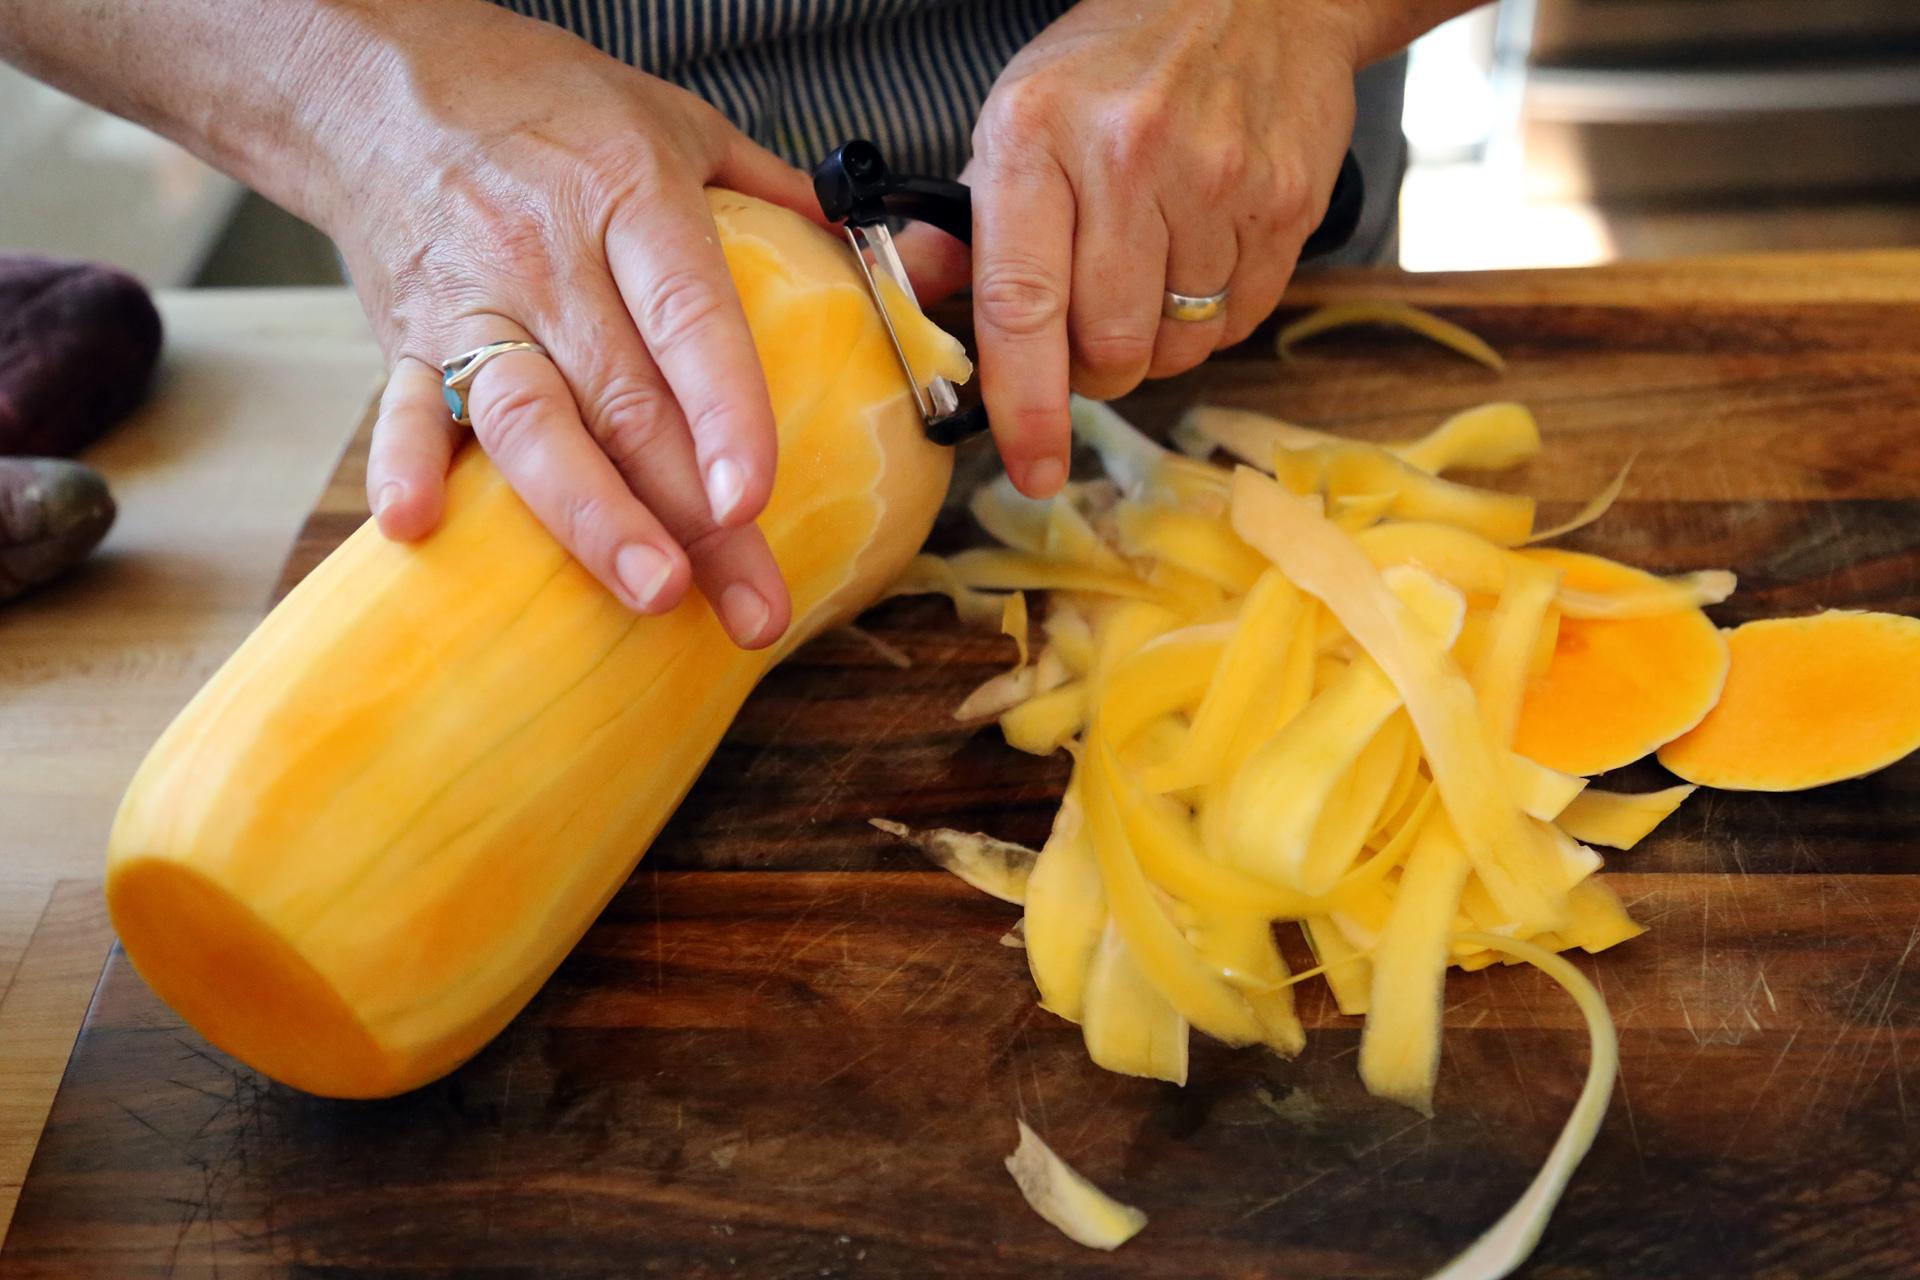 Peel the butternut squash